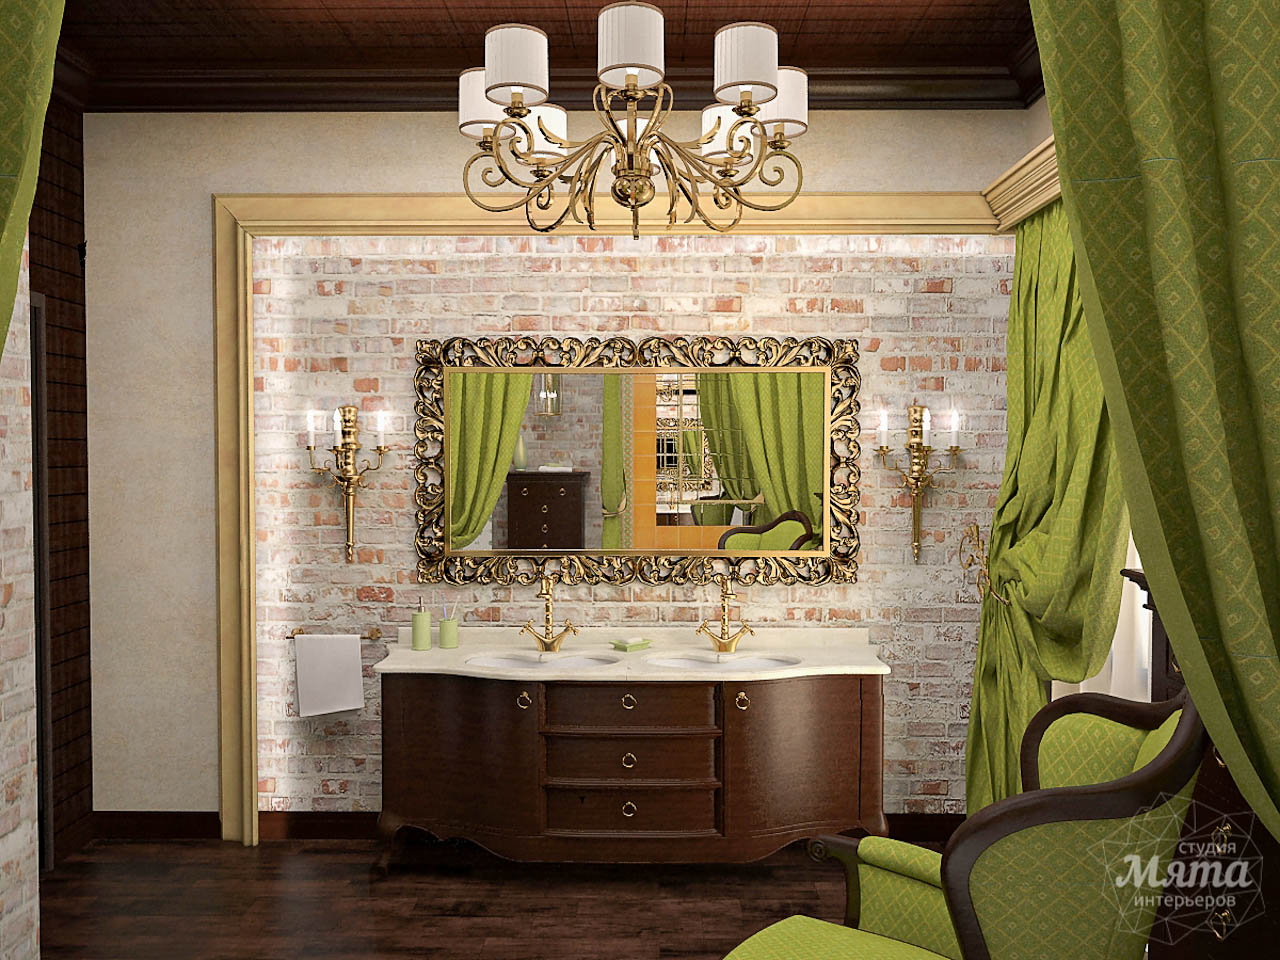 Дизайн интерьера коттеджа по ул. Ландышевая 23 img1575991452